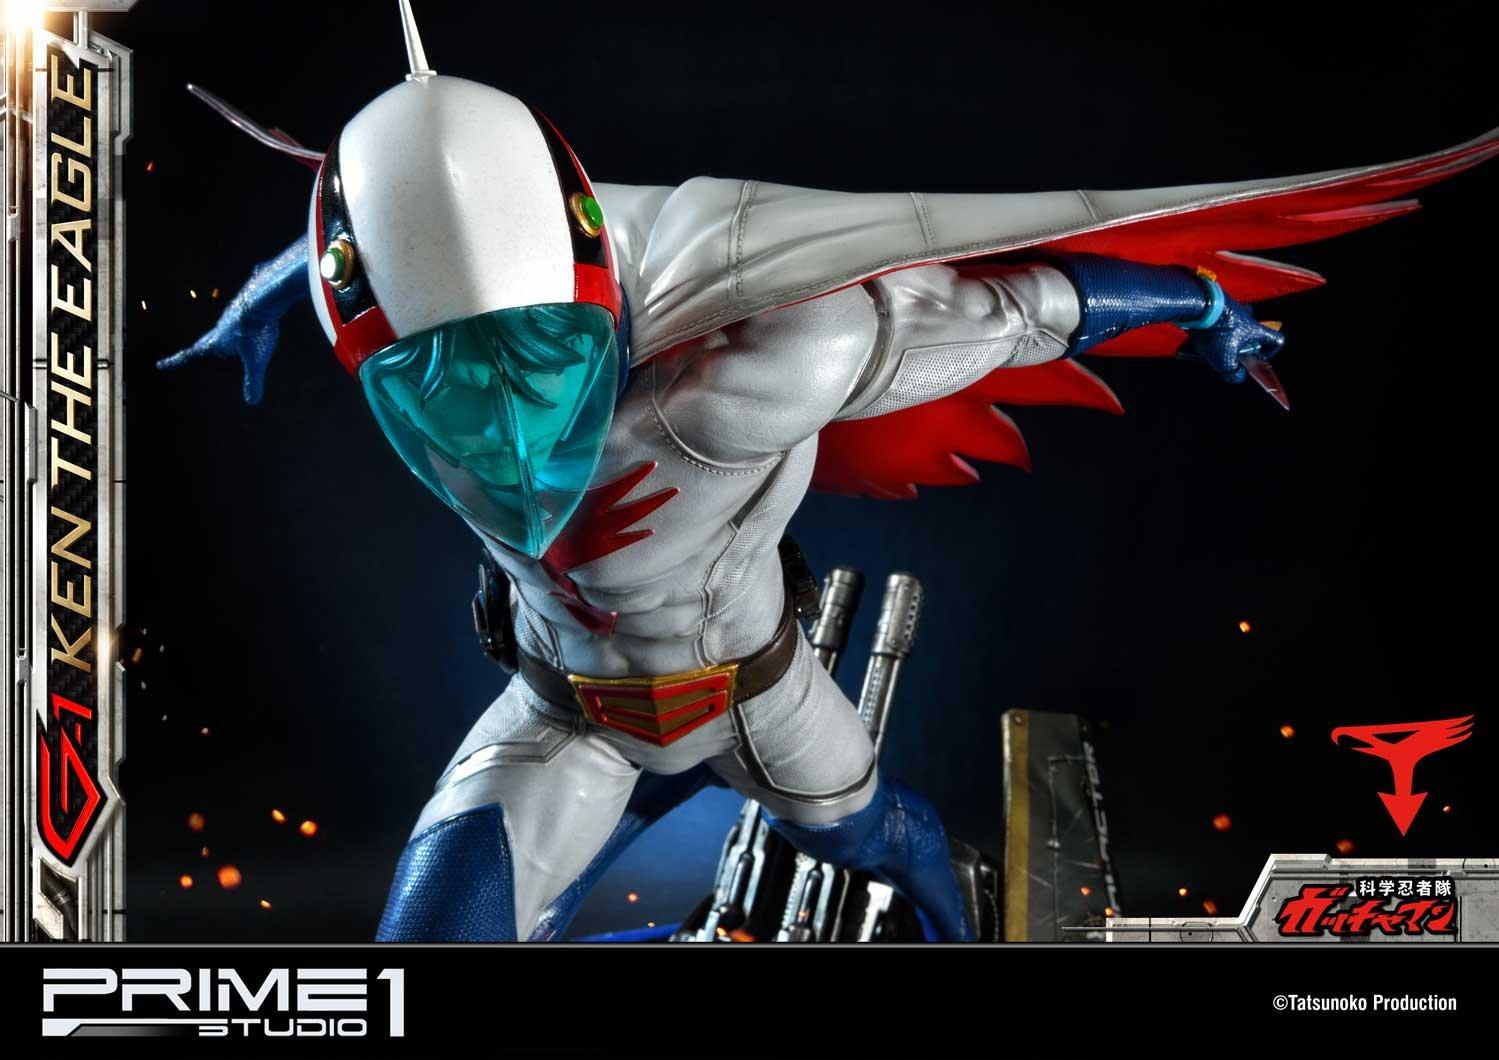 Prime-1-Gatchaman-Ken-Statue-037.jpg.05e7655cf19940fdc74f4627c25771c5.jpg